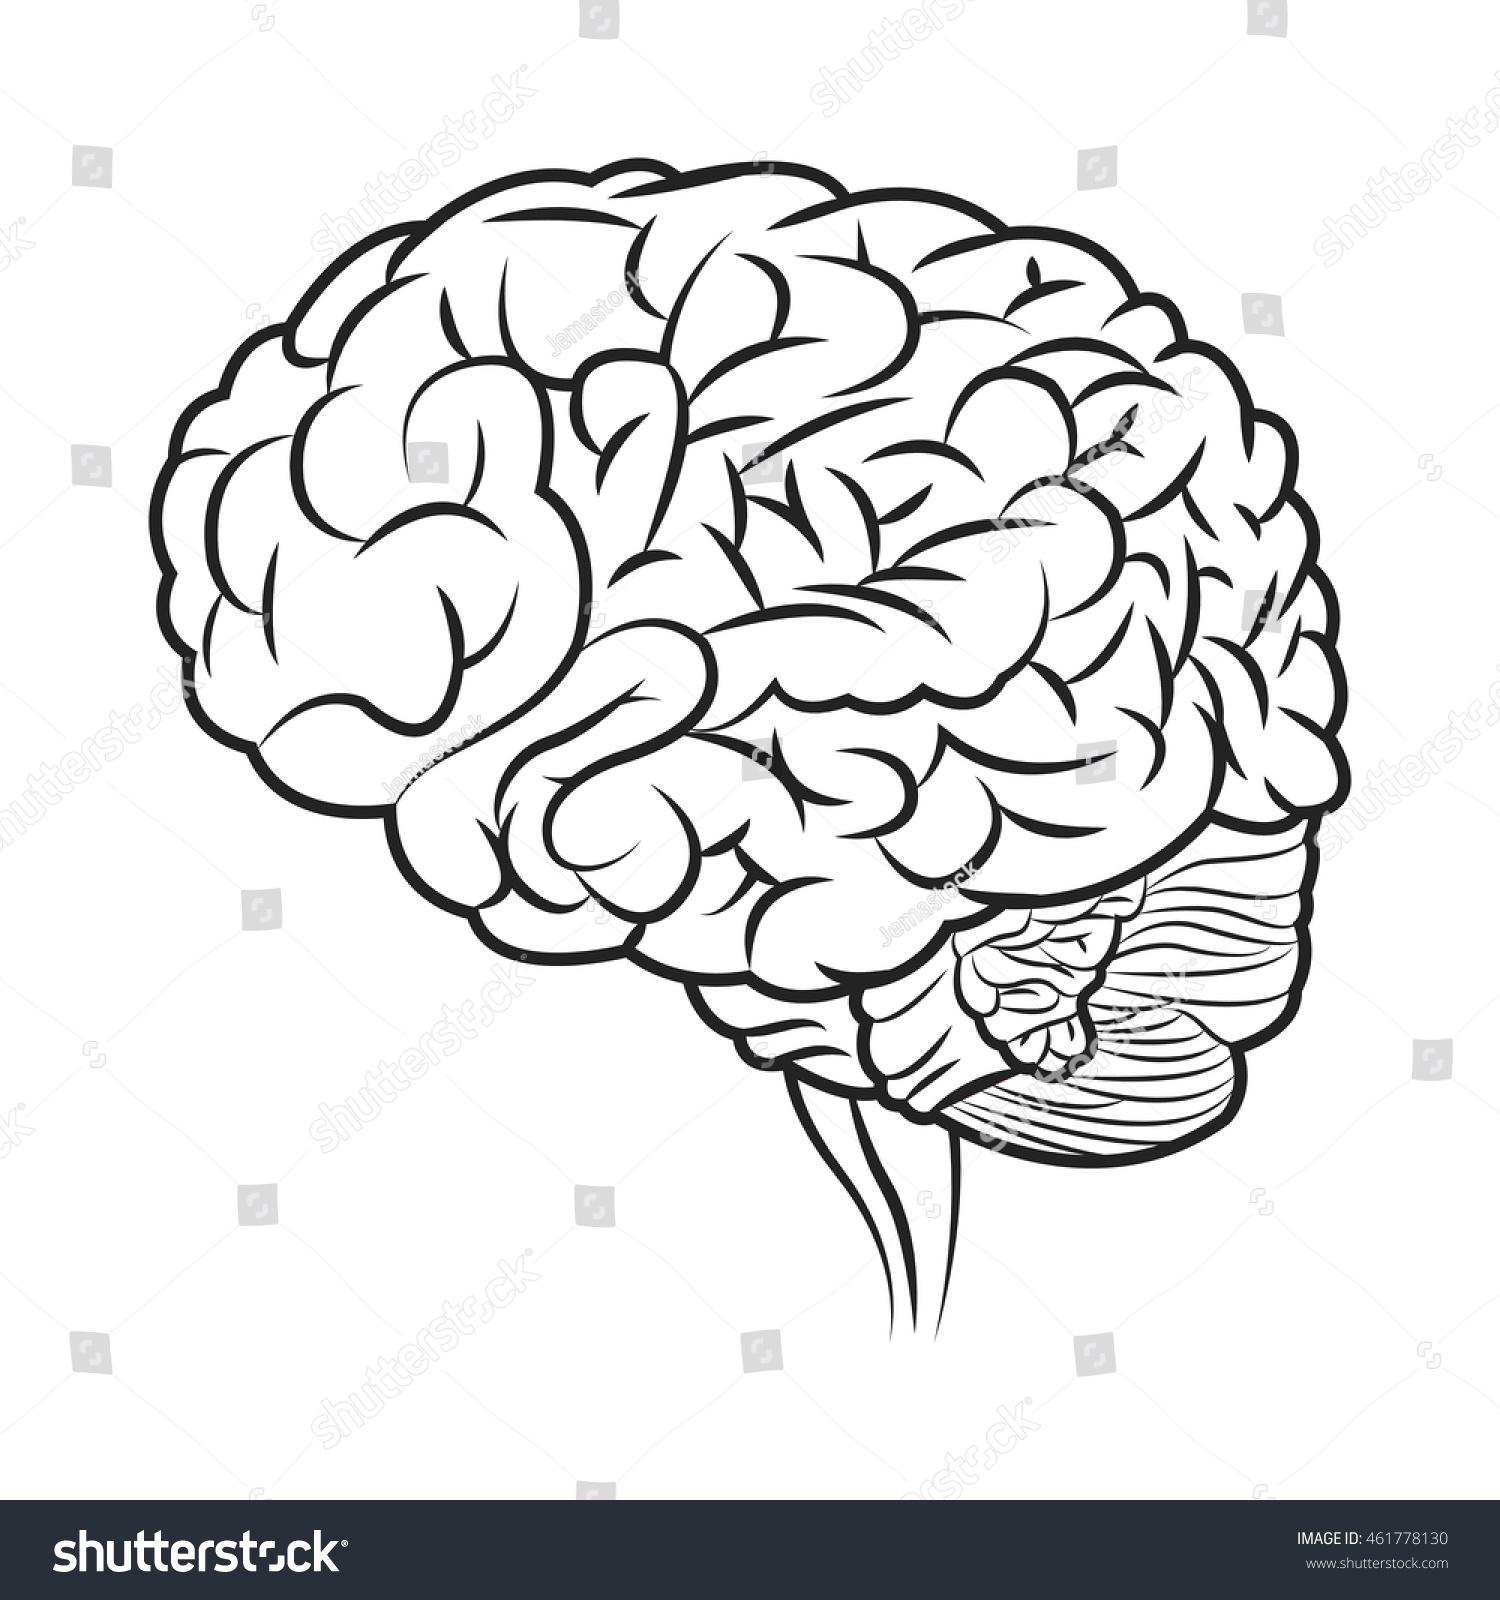 flat brain icon - photo #32